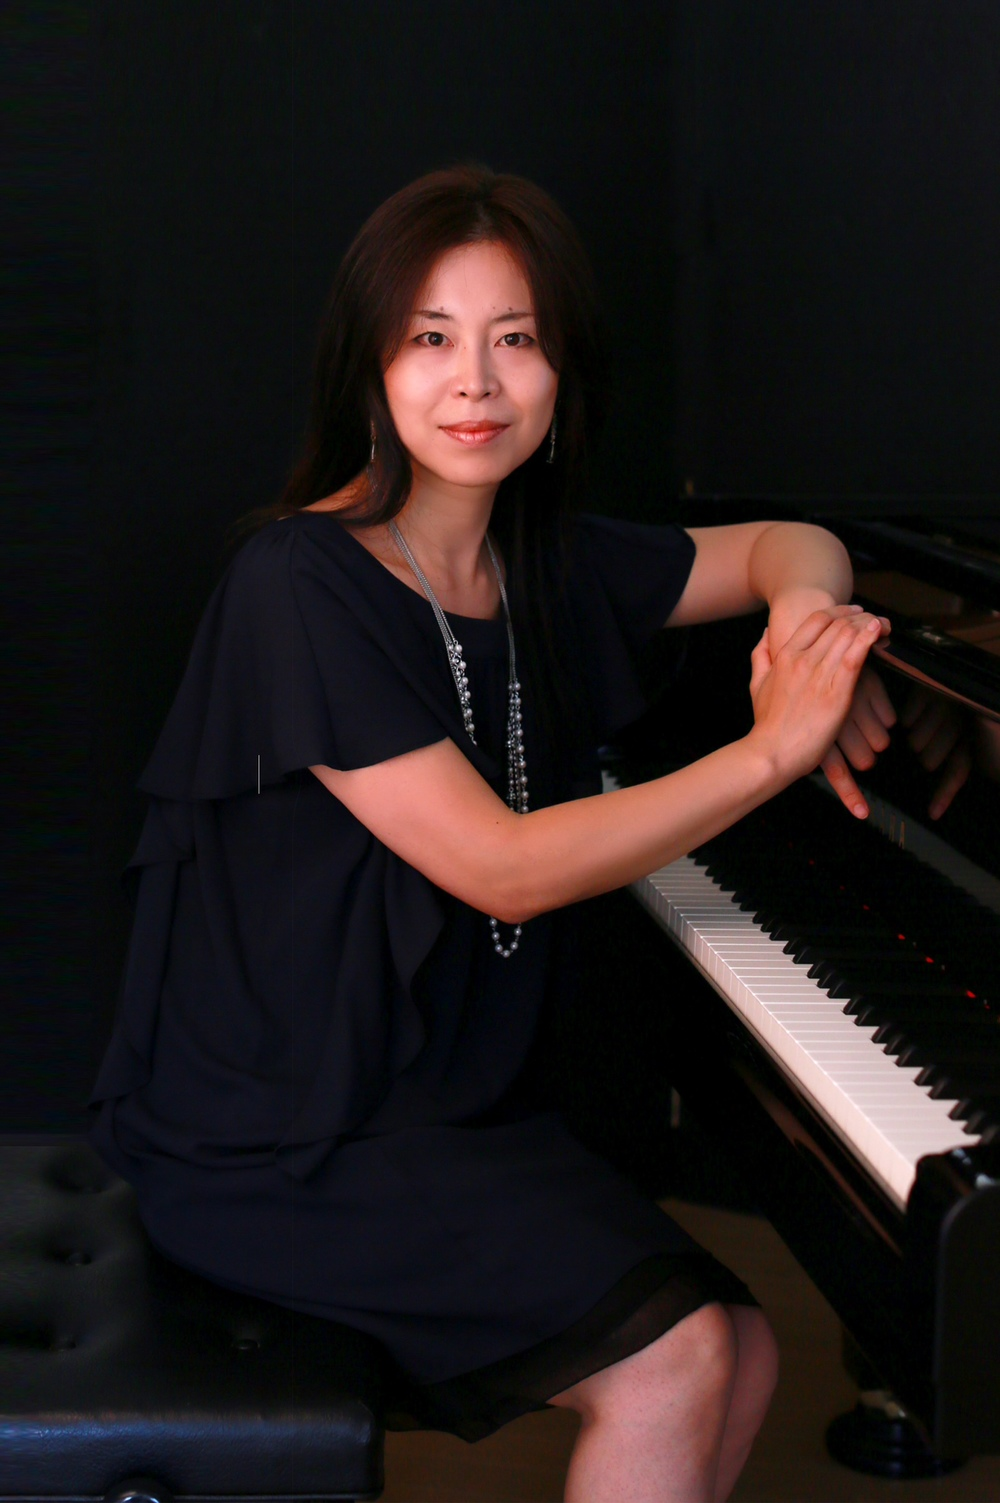 yuka_piano.JPG